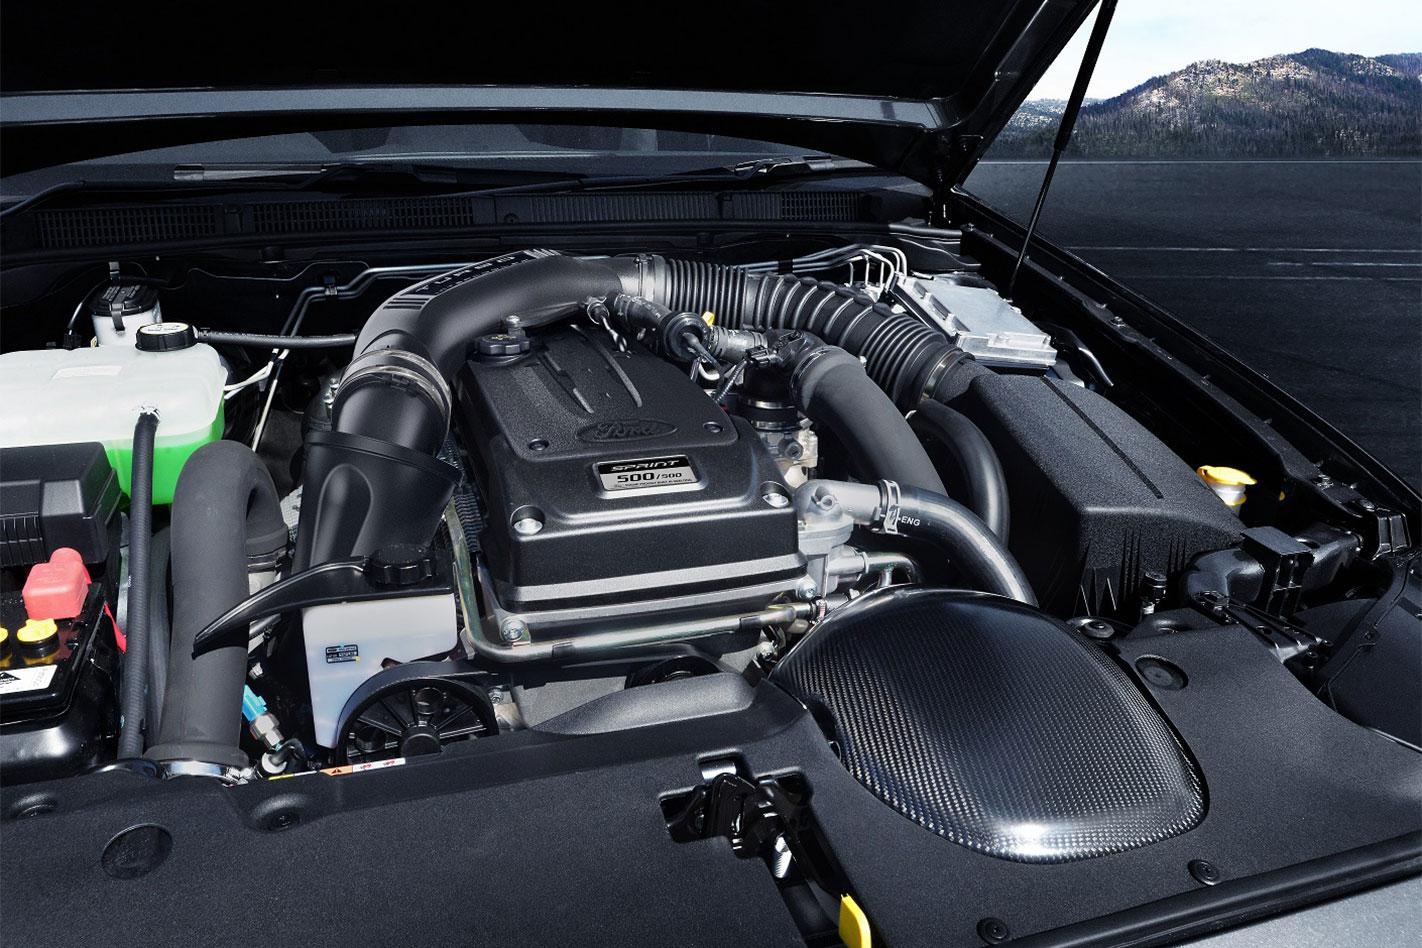 Ford -Falcon -XR6-Sprint -carbon -intake -main